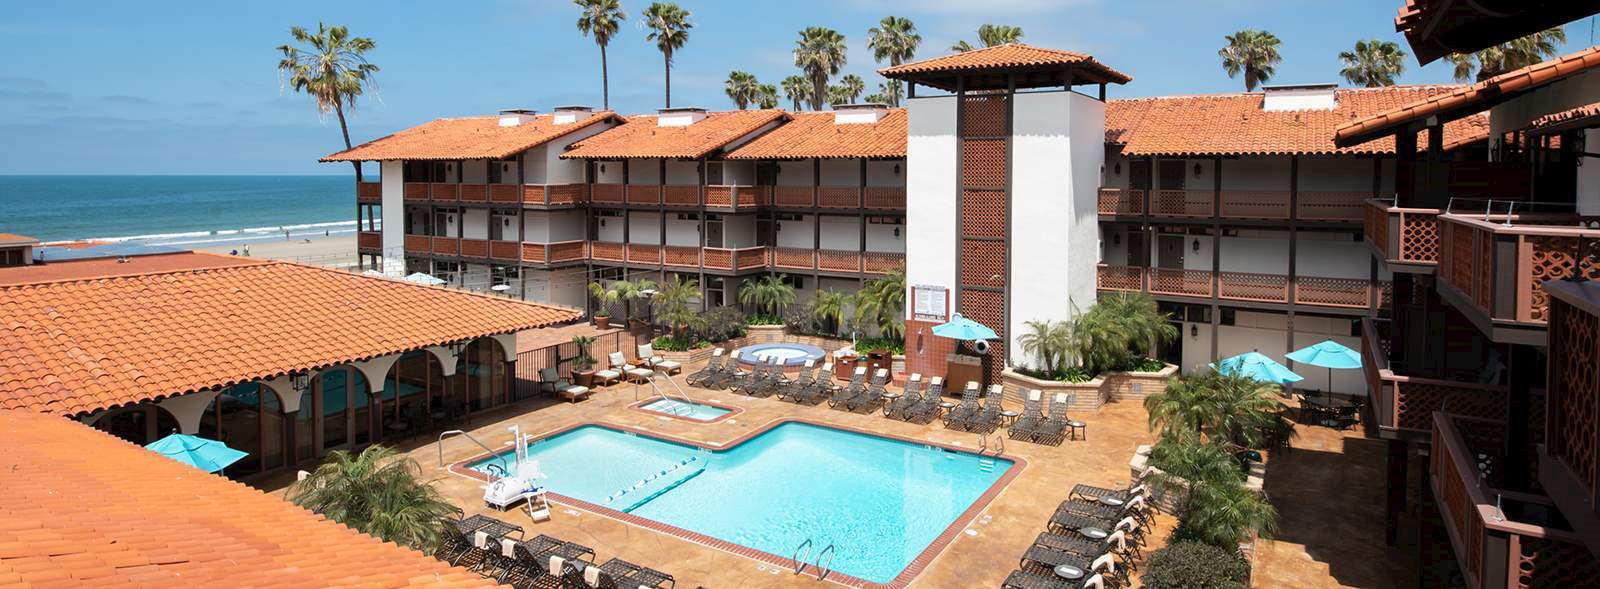 Amenities of La Jolla Shores Hotel California